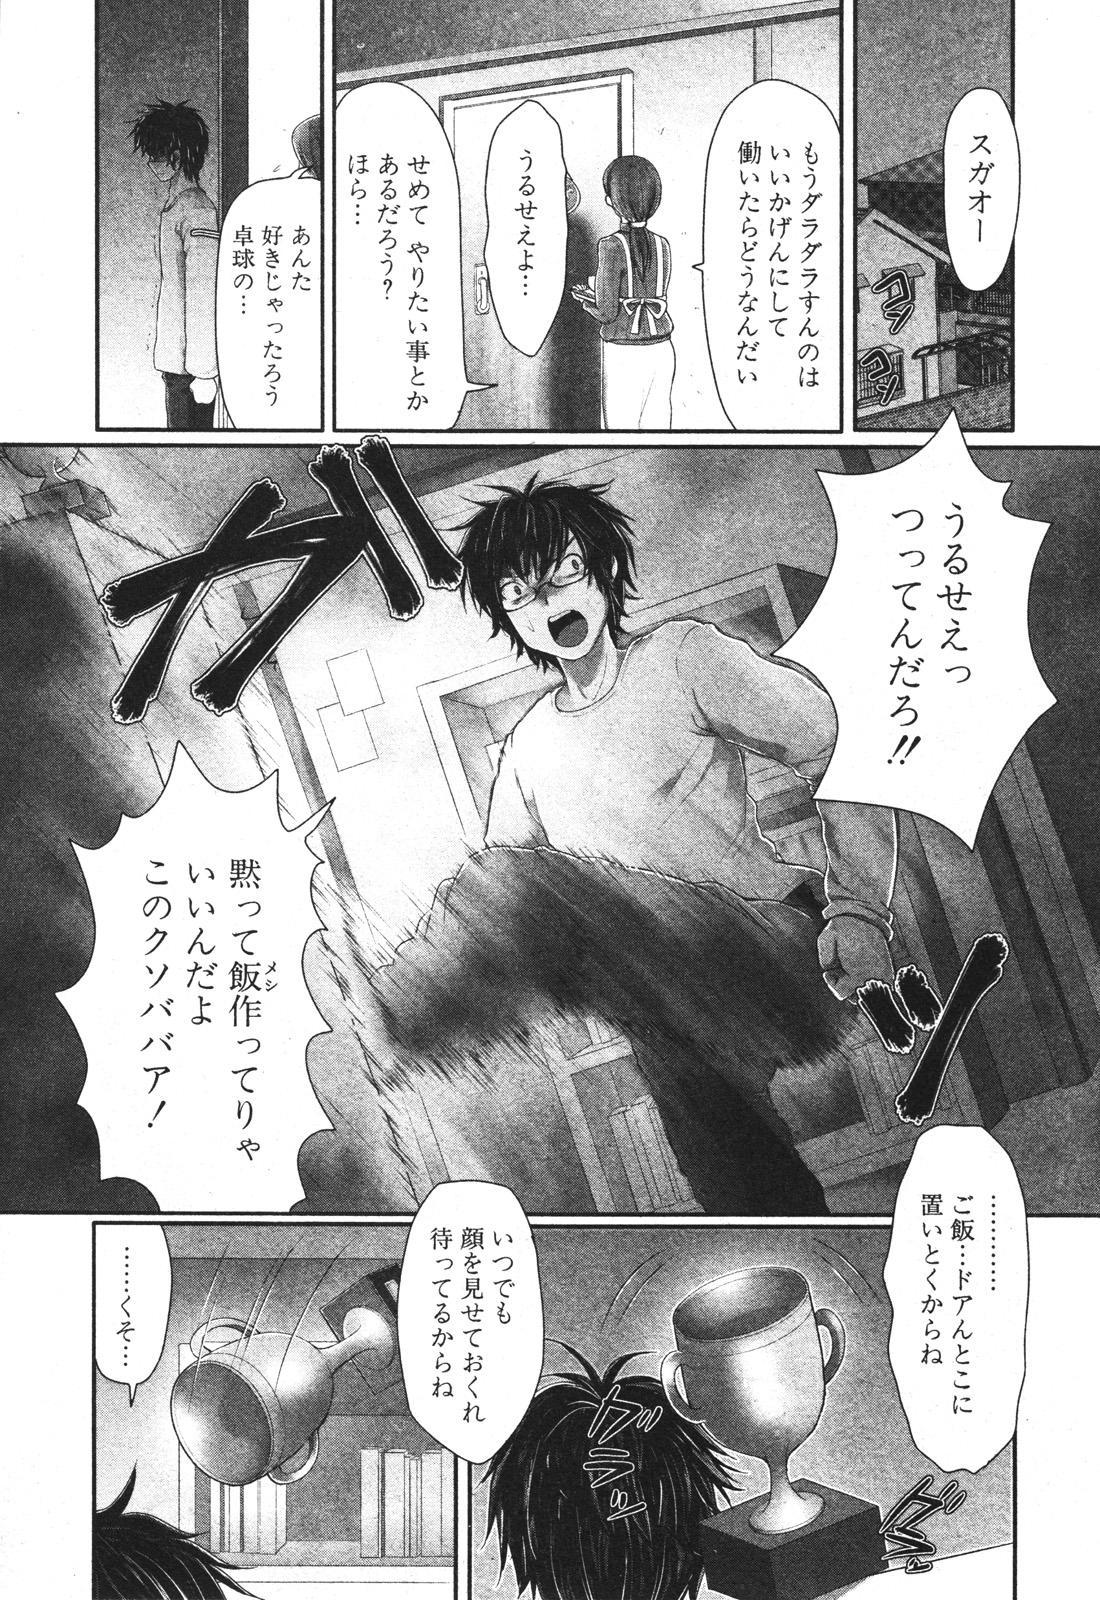 BUSTER COMIC 2010-05 Vol.07 348